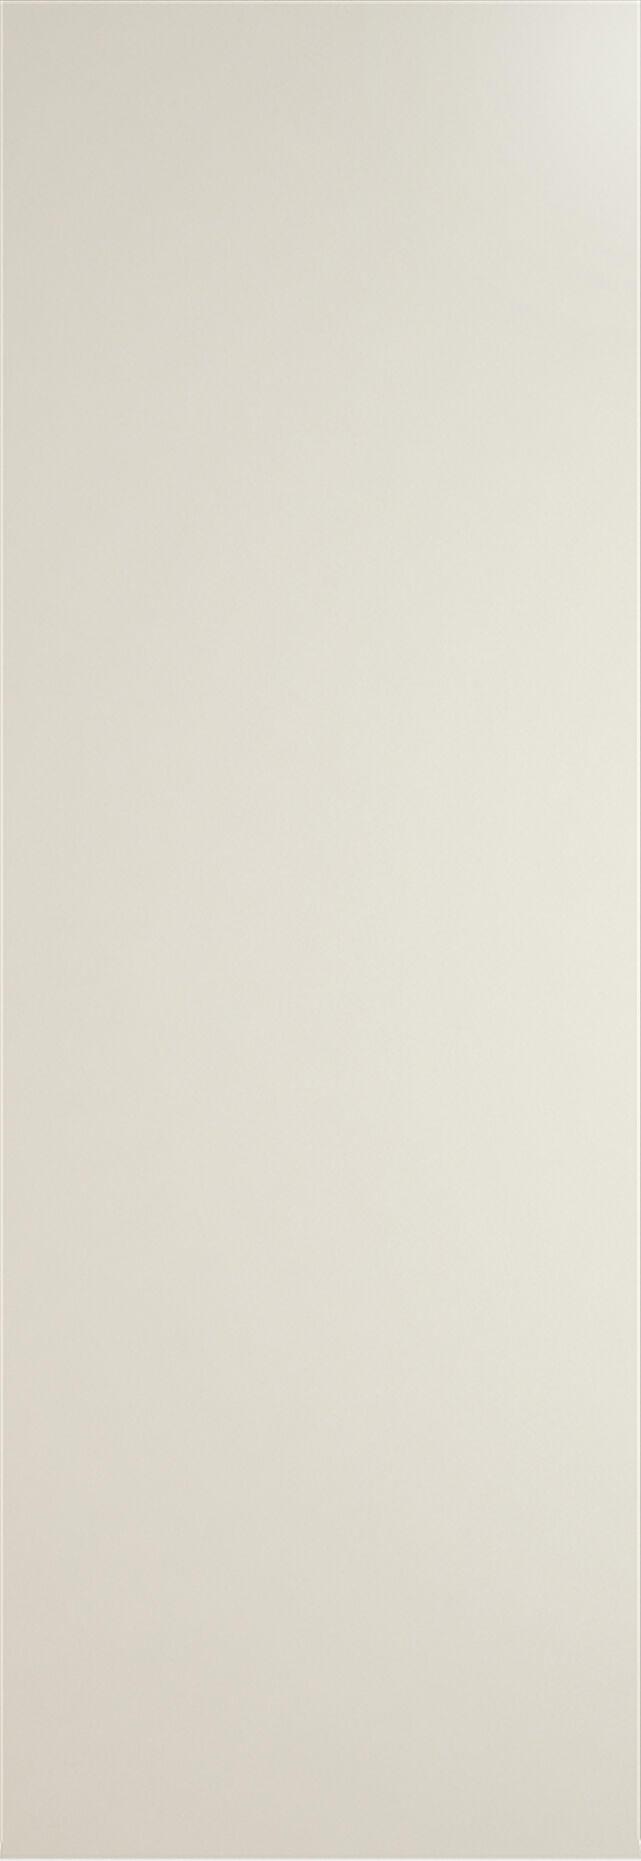 Tivoli А-1 Invisible цвет - Жемчужная эмаль Без стекла (ДГ)